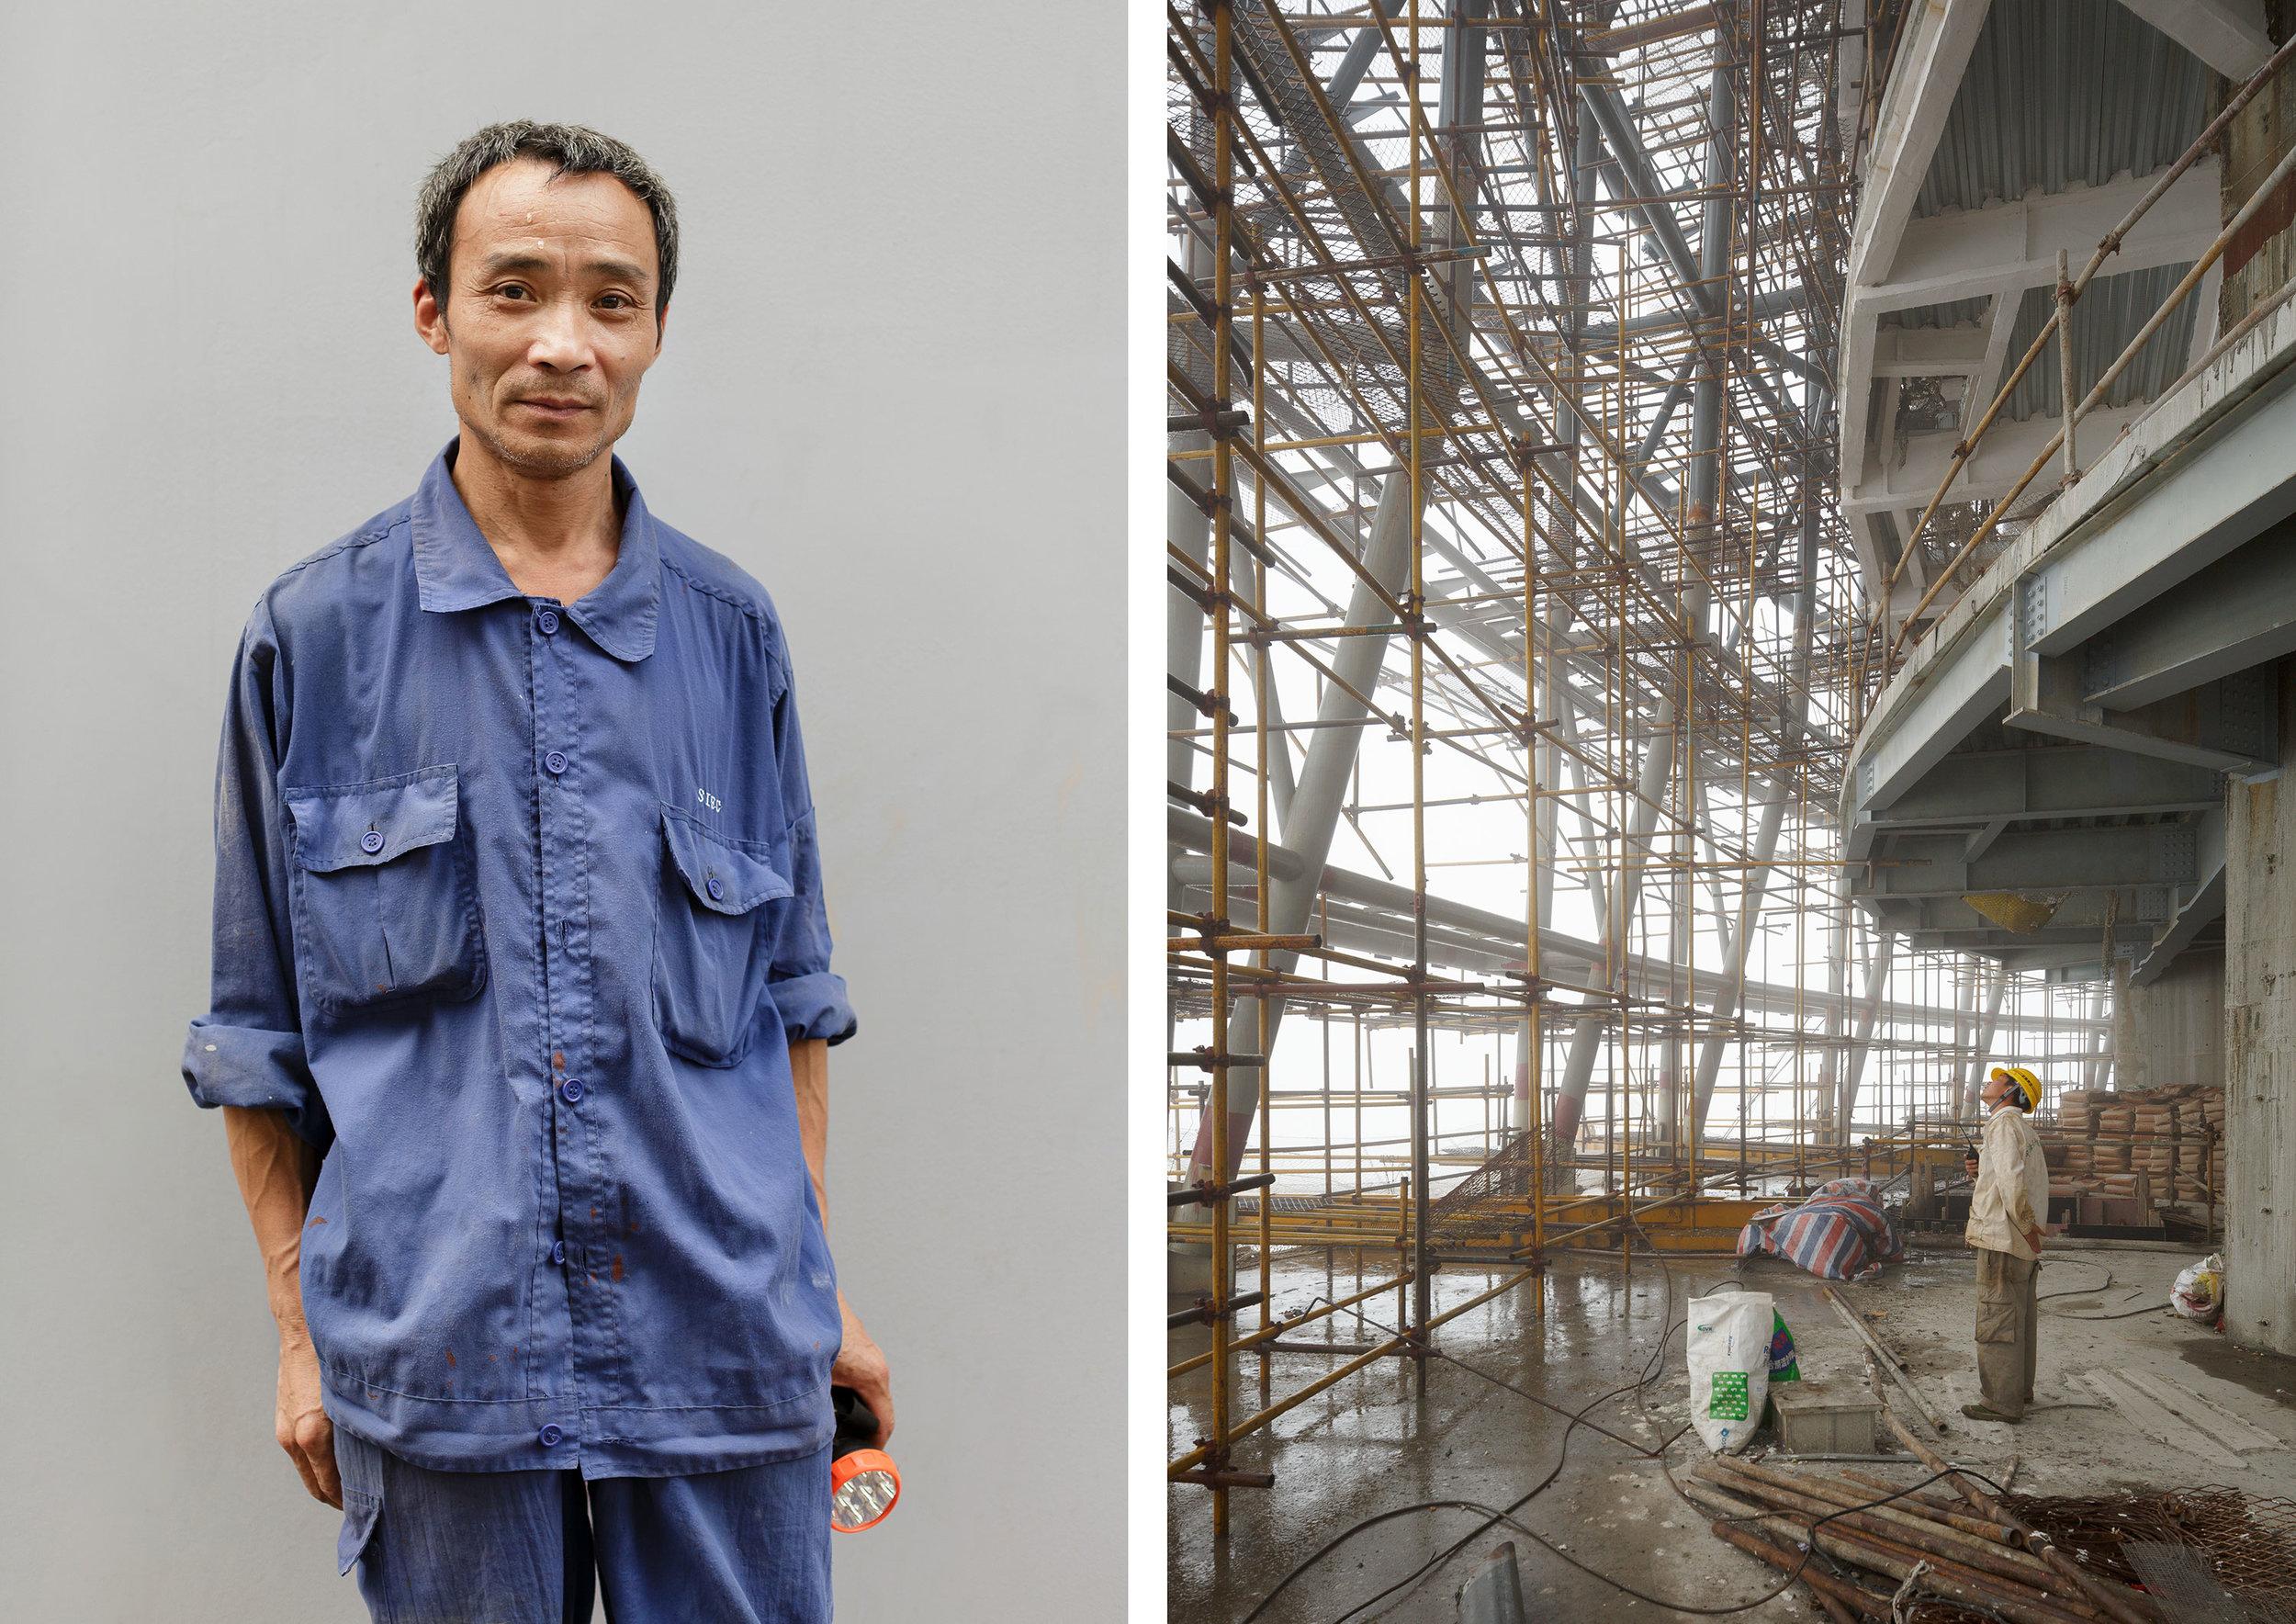 Shanghai_Tower-workers-and-building15.jpg